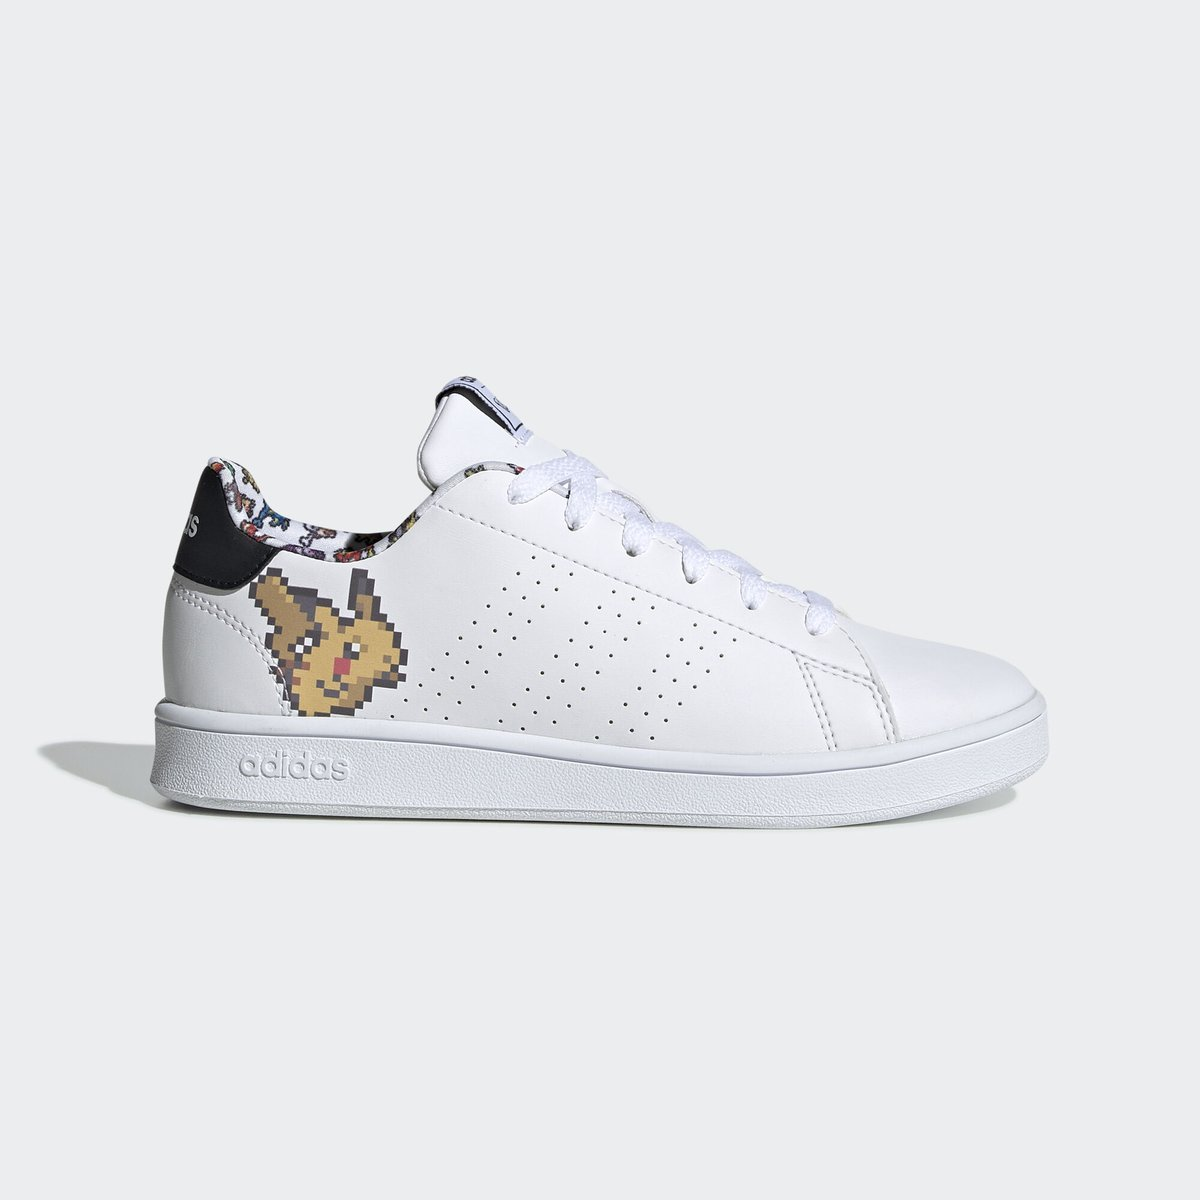 adidas鞋舌【多图】_价格_图片 天猫精选